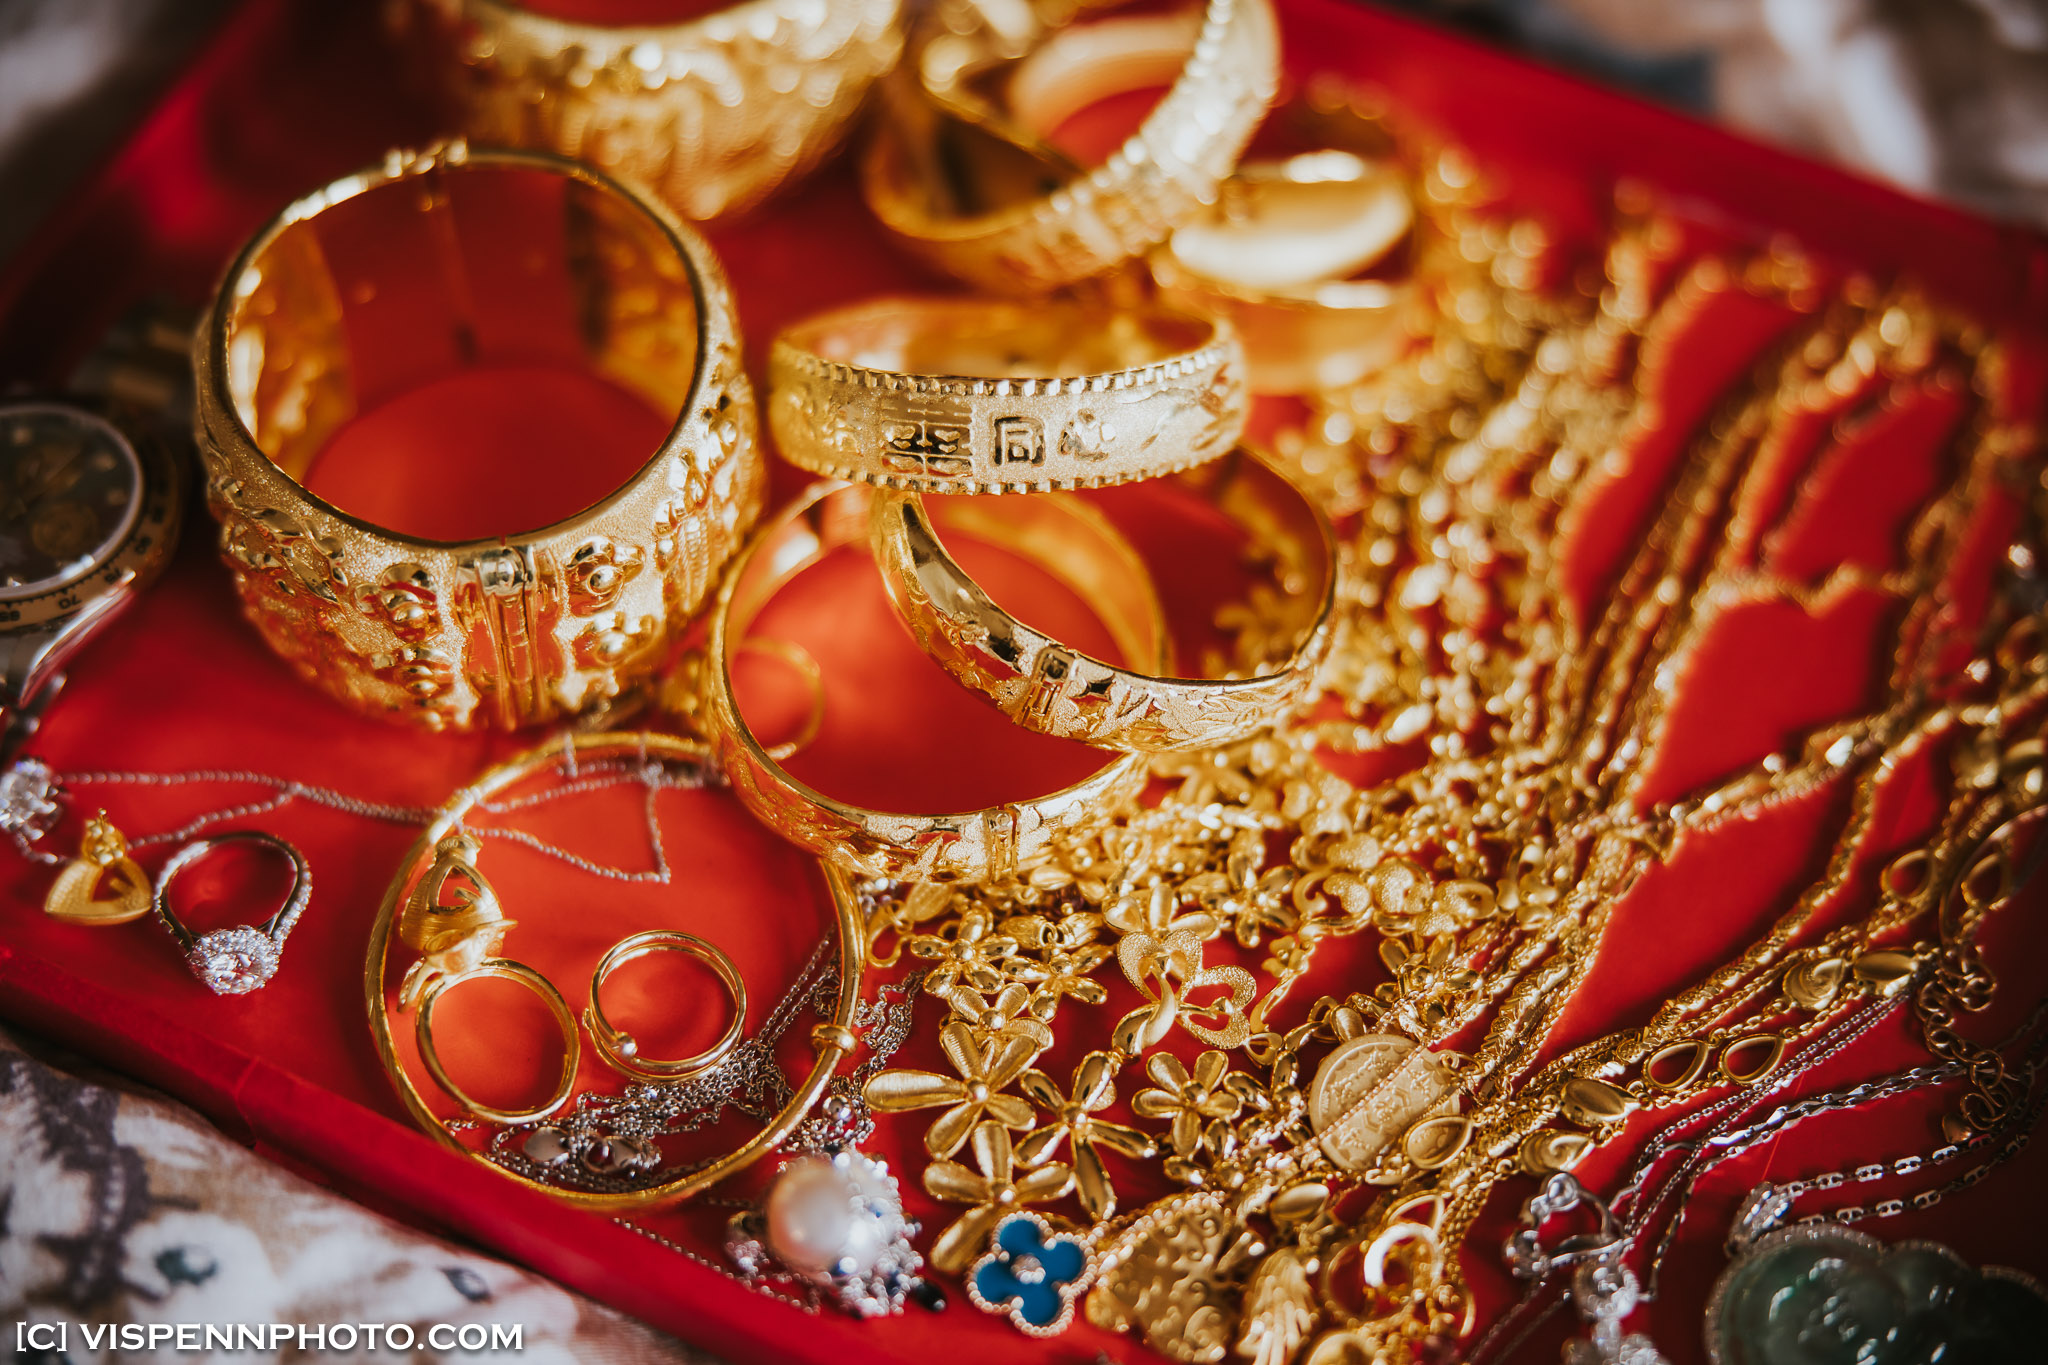 WEDDING DAY Photography Melbourne ElitaPB 00202 1P EOSR ZHPENN